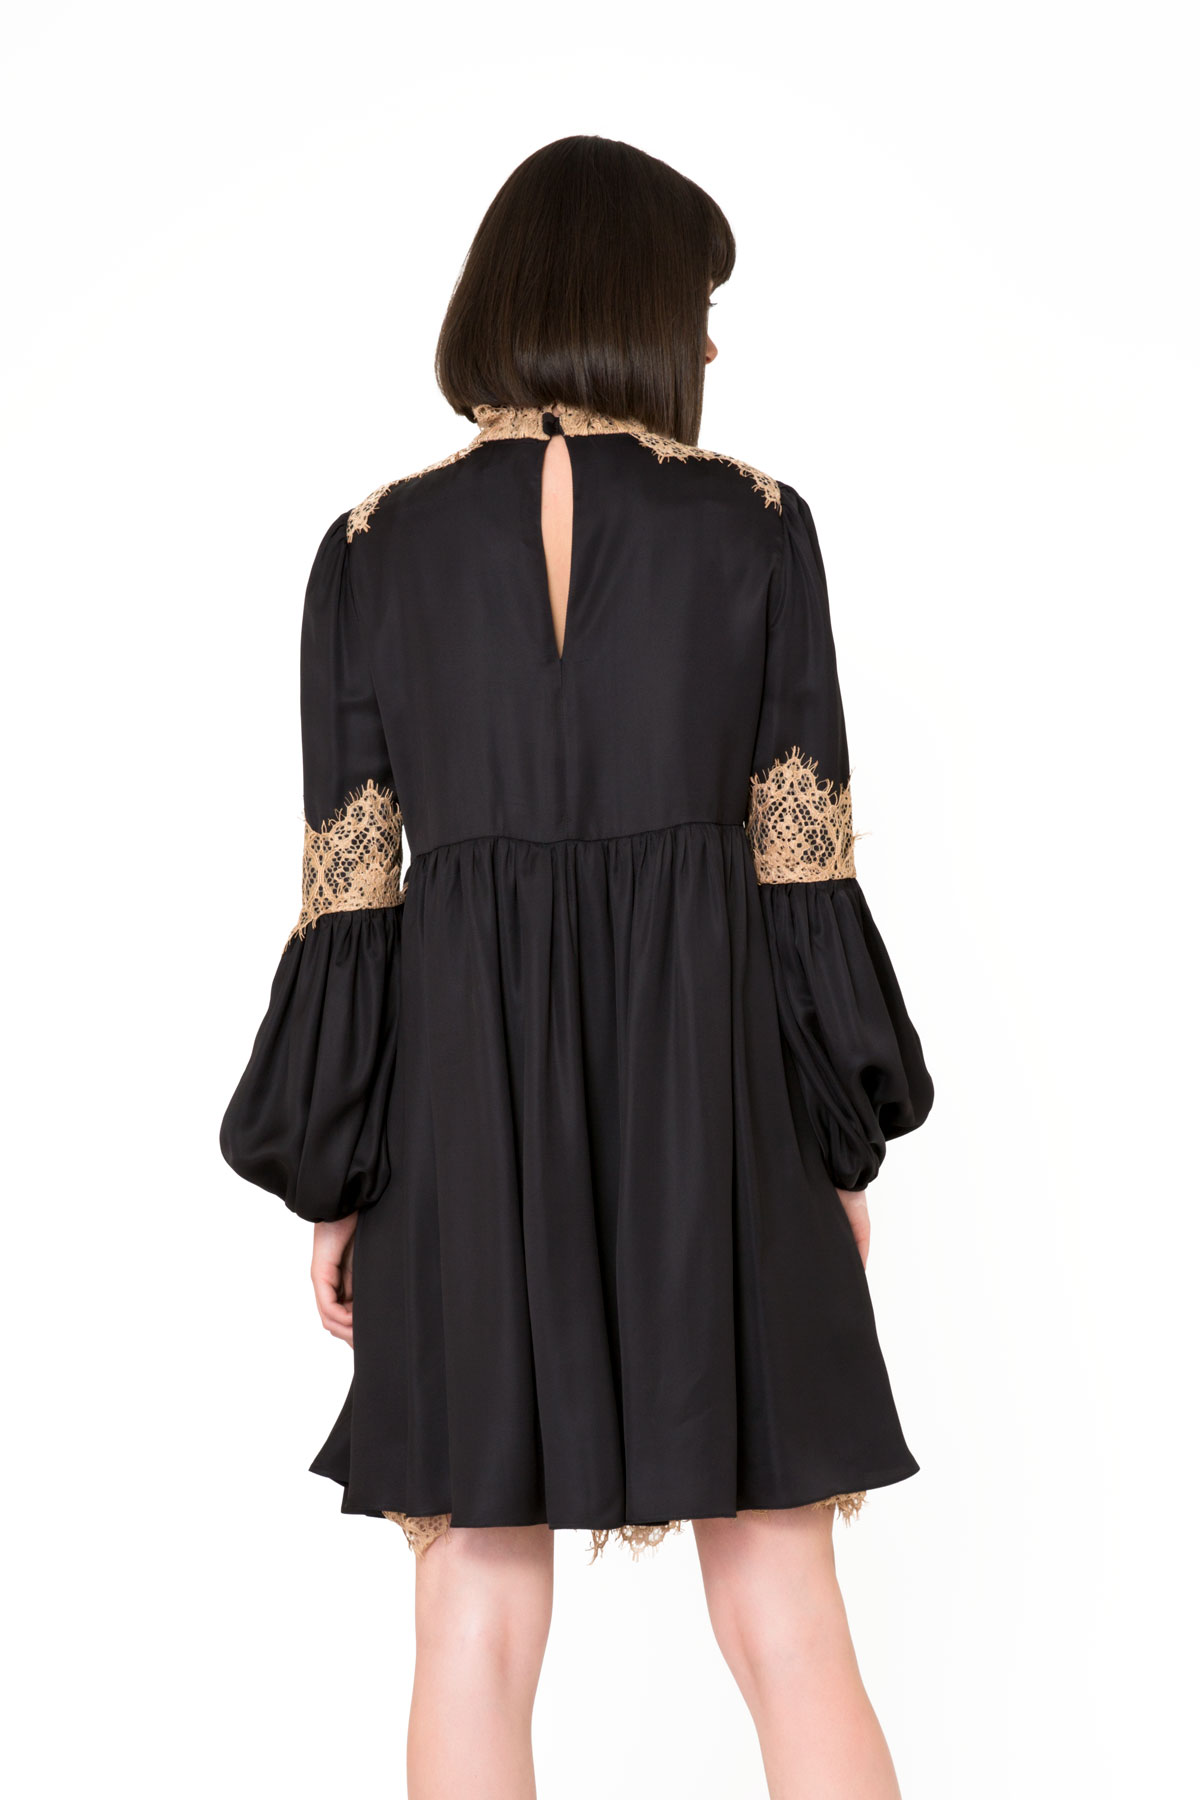 Lace Detail Black Midi Dress